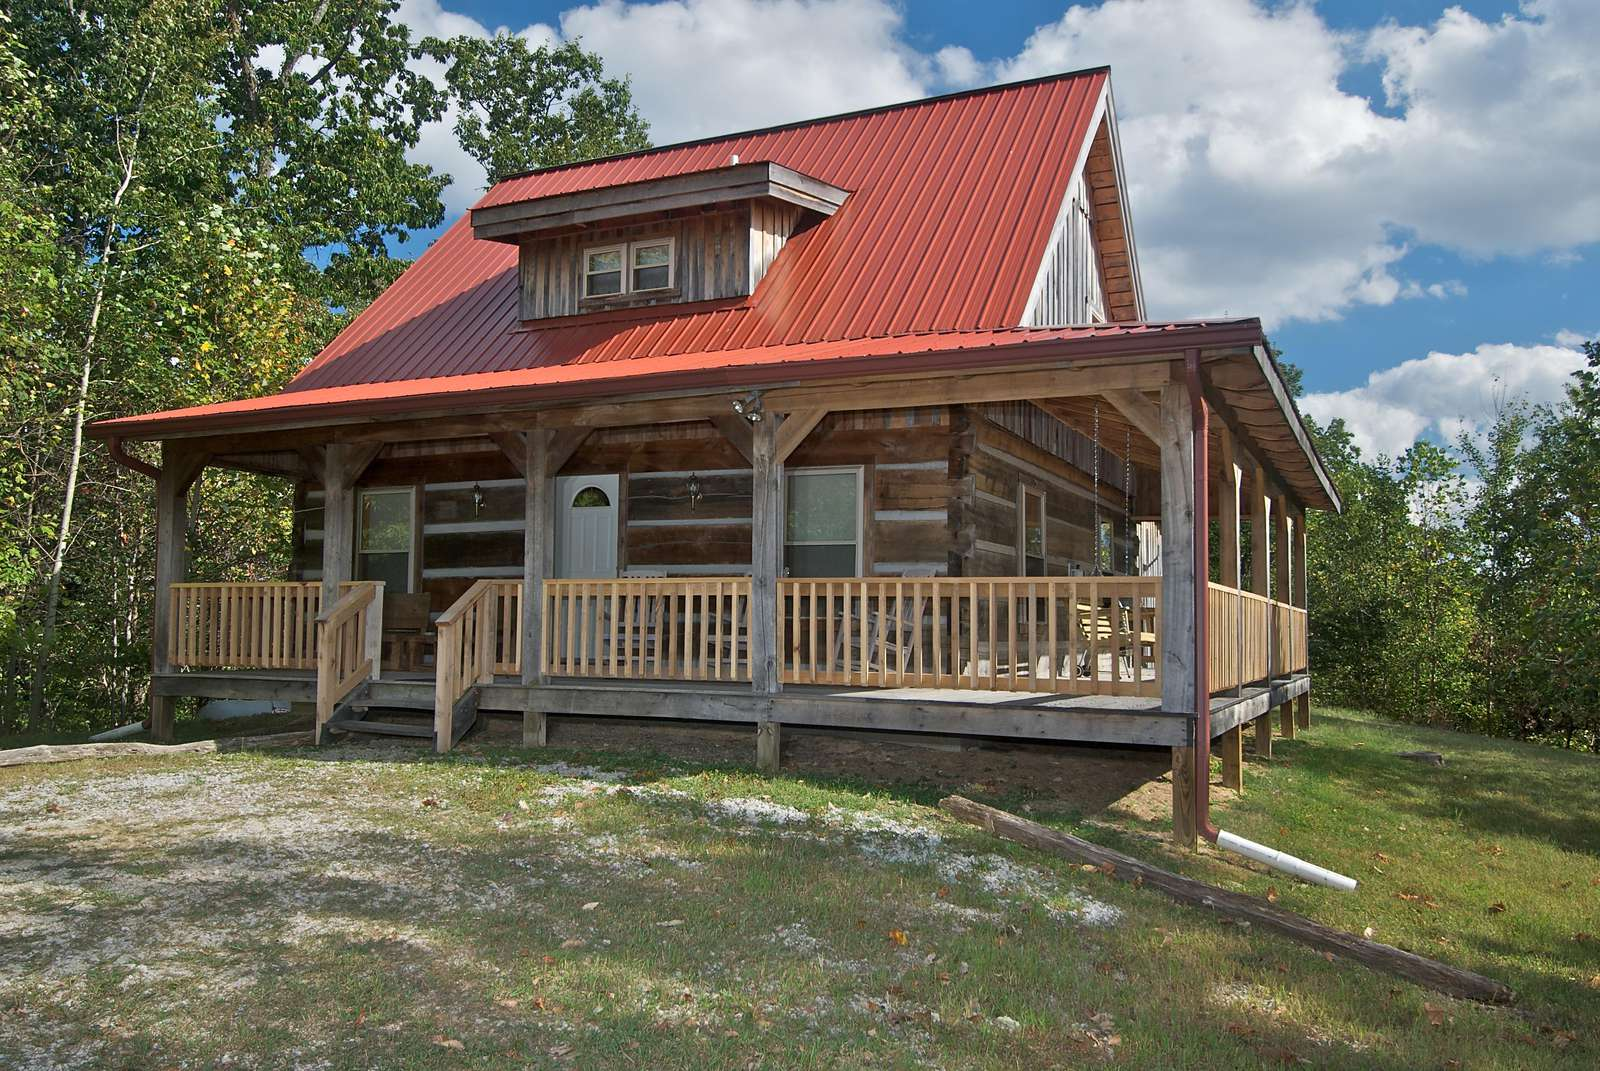 Dogwood Point Log Cabin - property